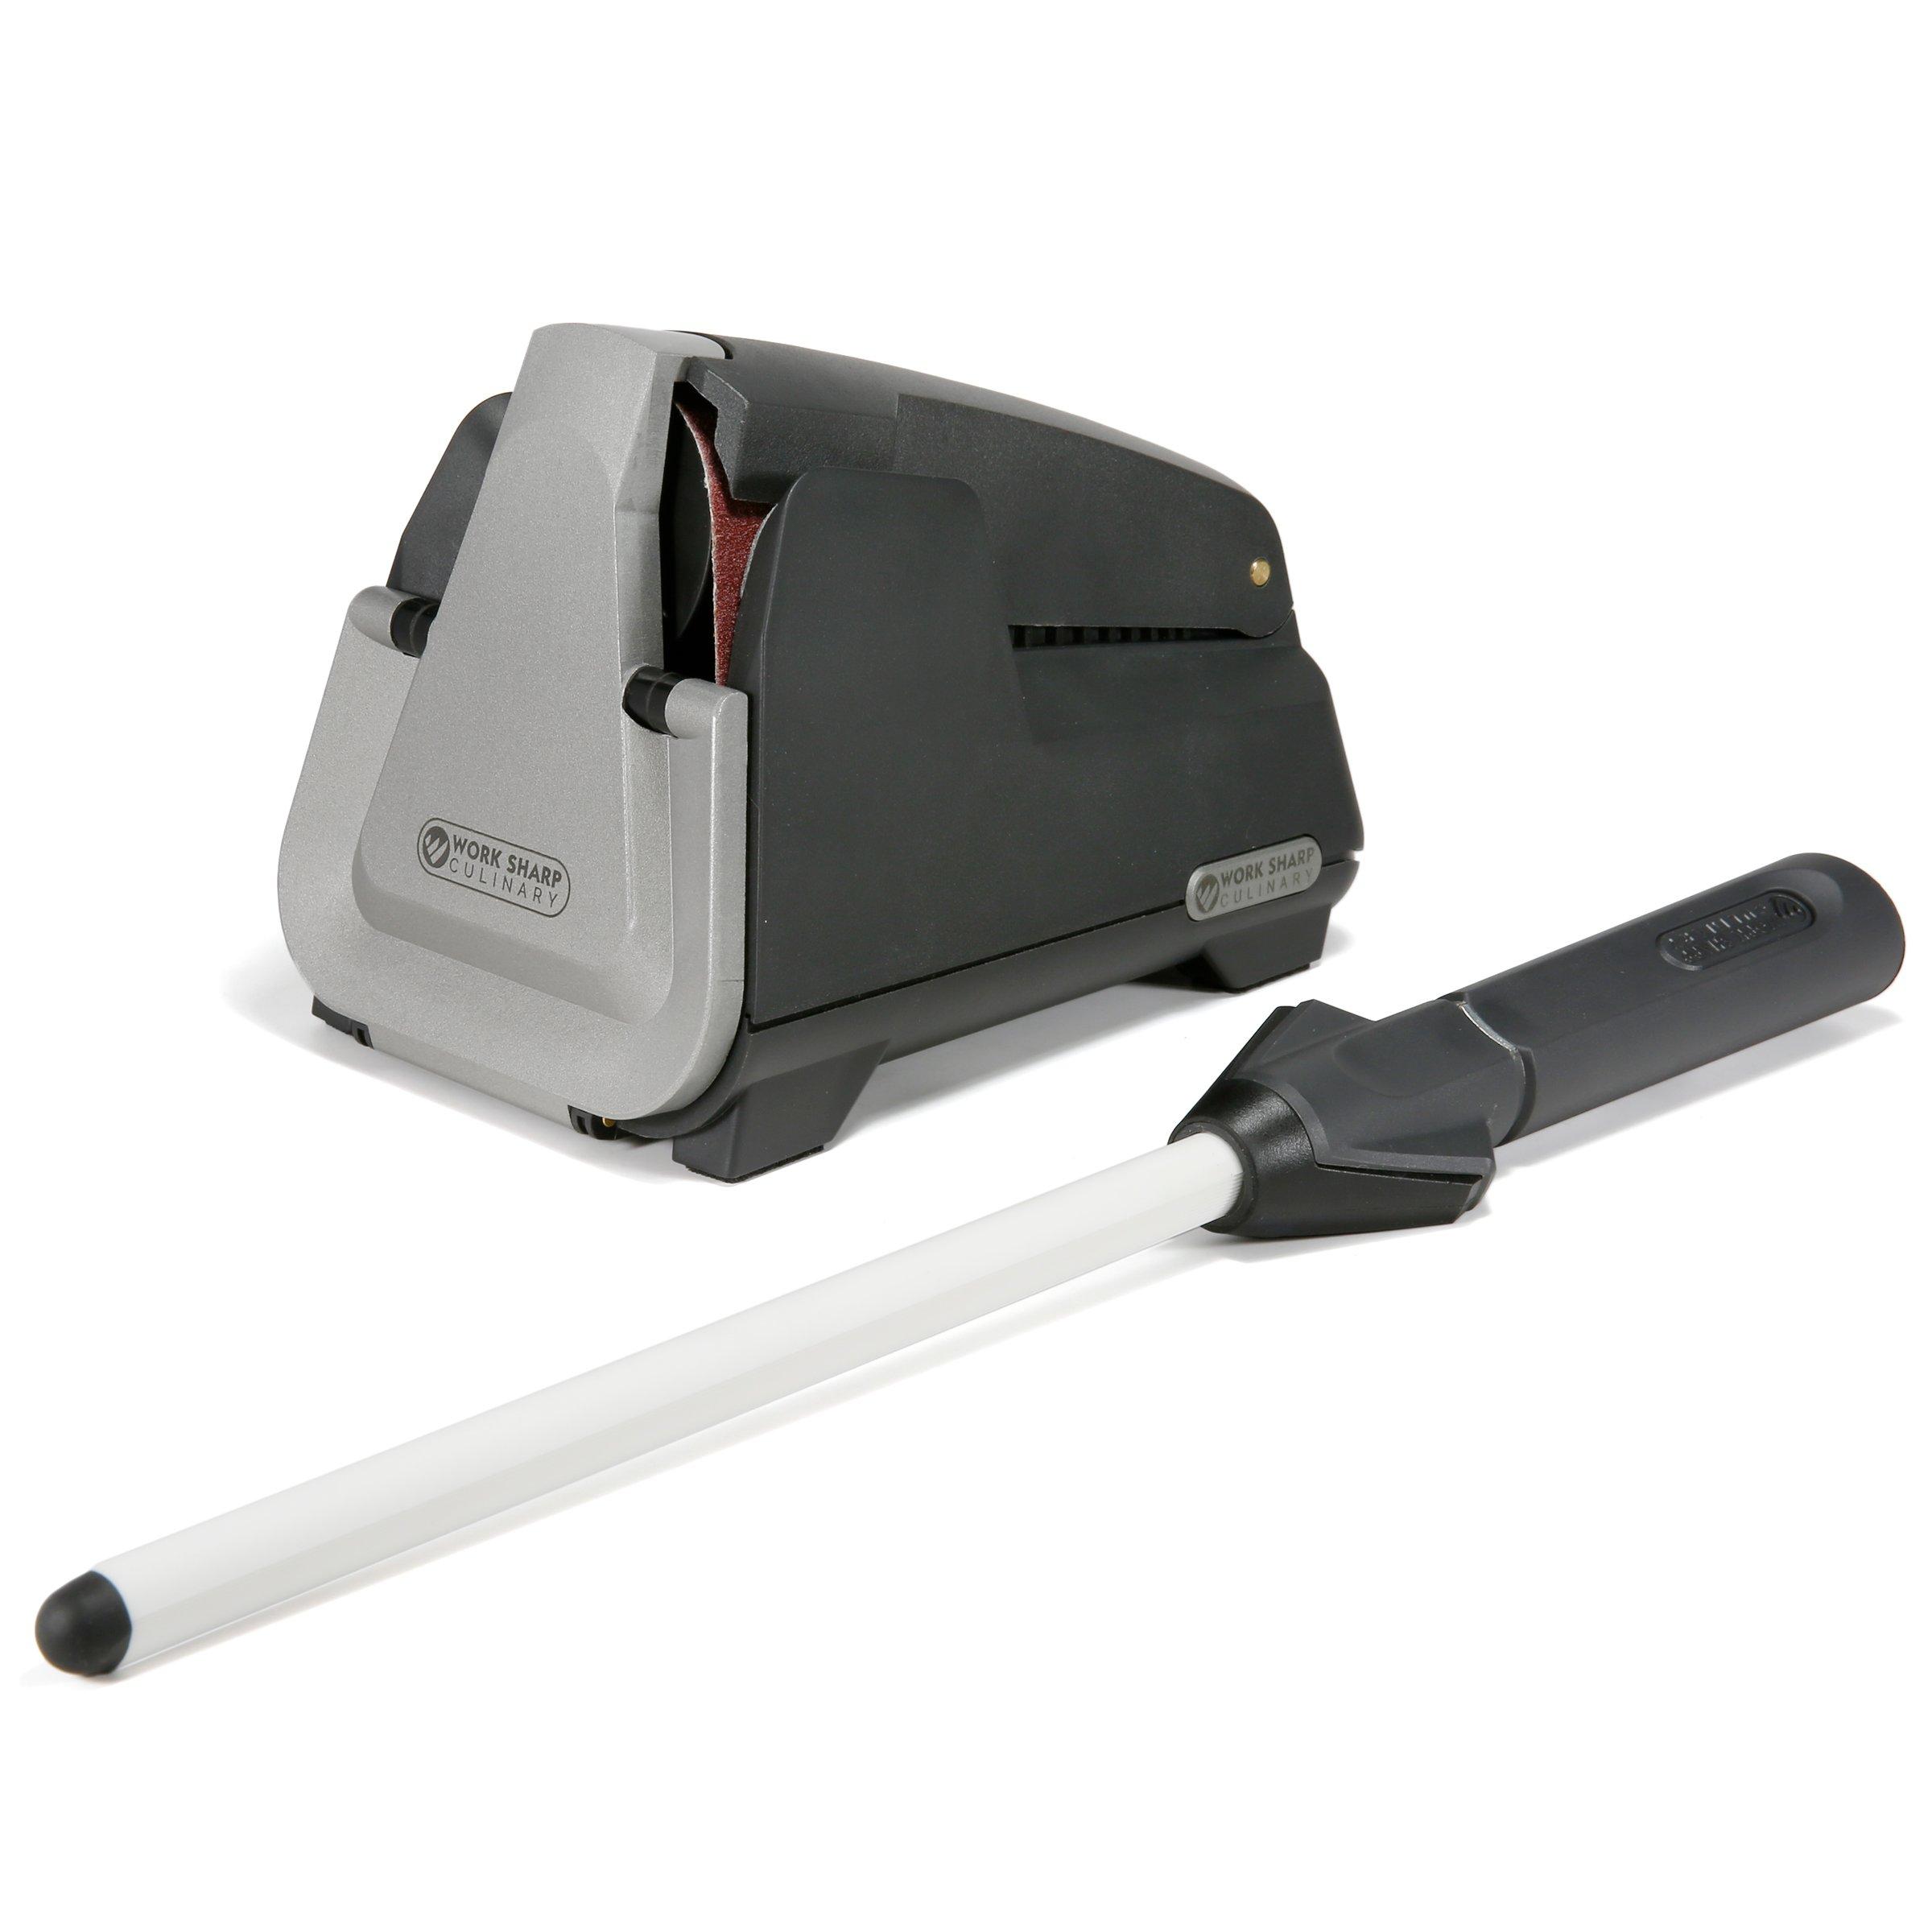 Work Sharp Culinary E3 Electric Kitchen Knife Sharpener